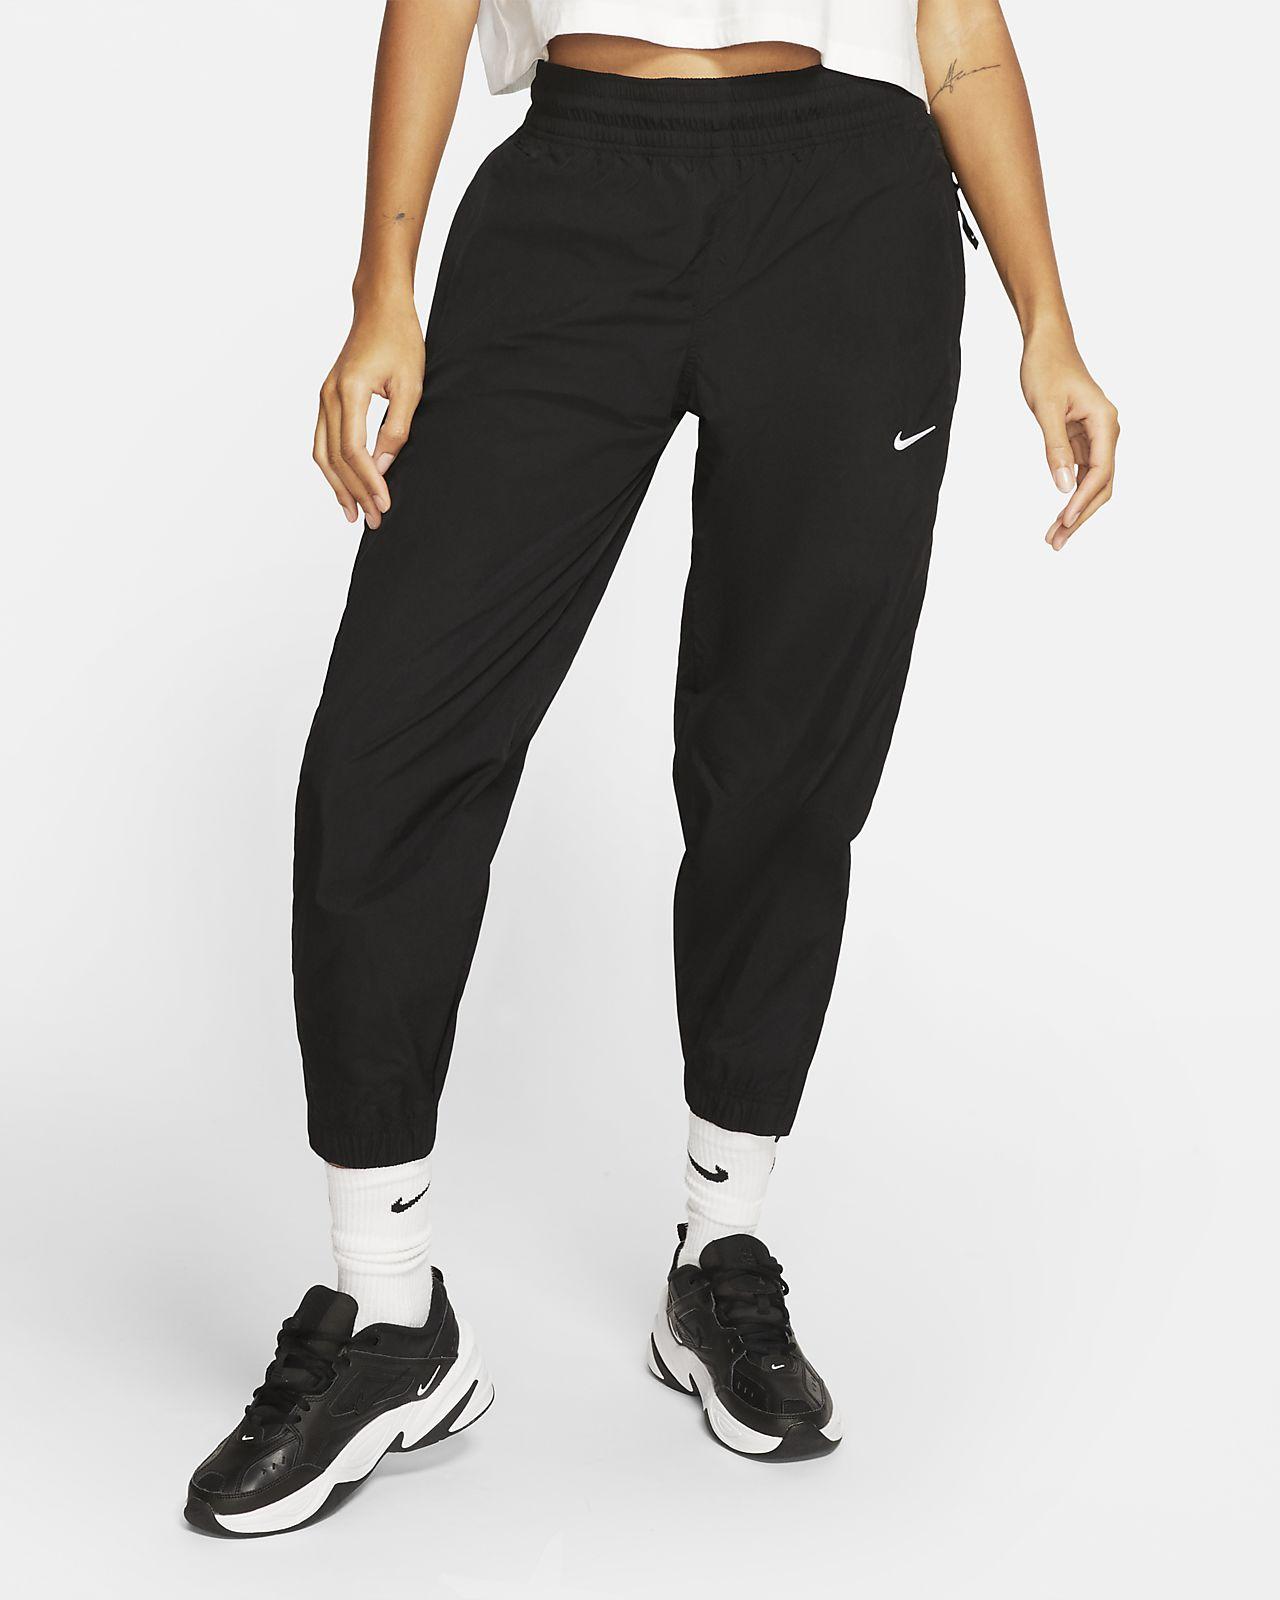 Pantalon Chandal Nike Mujer Buy 70417 A078c